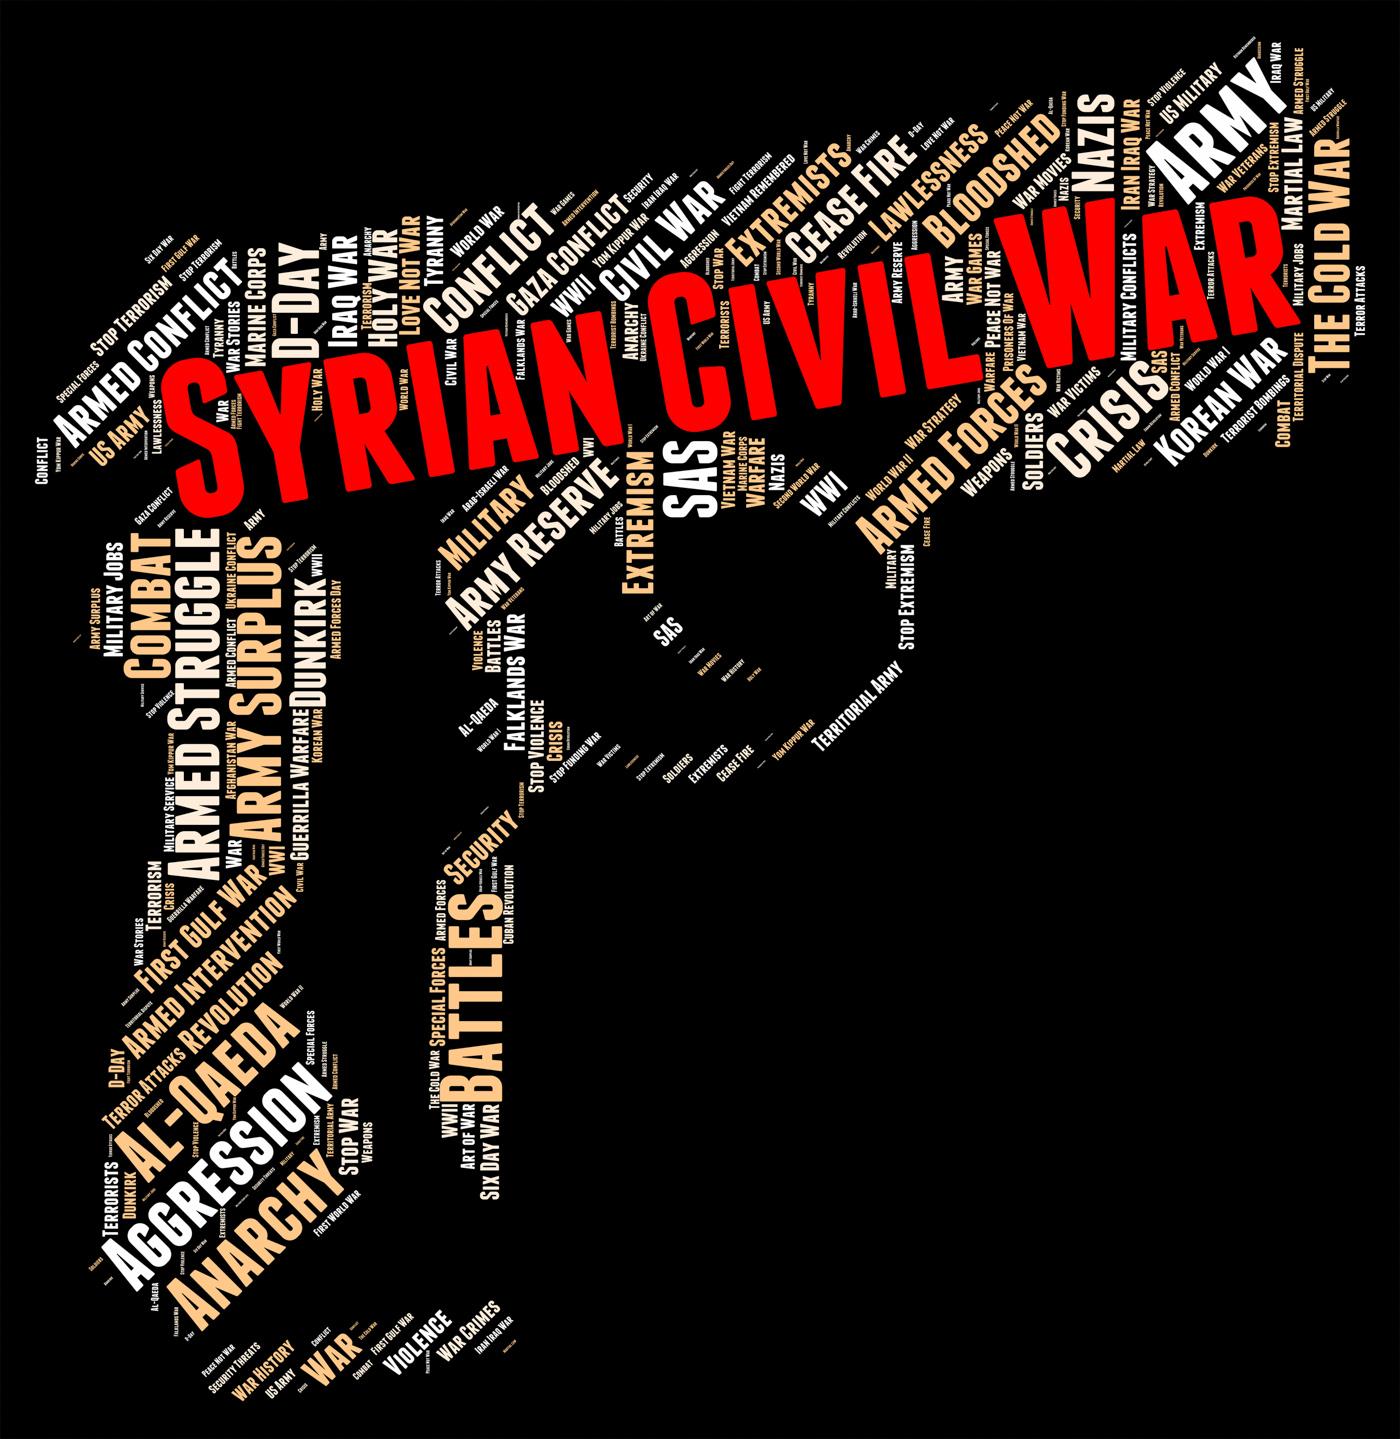 Syrian civil war represents bashar al-assad and administration photo